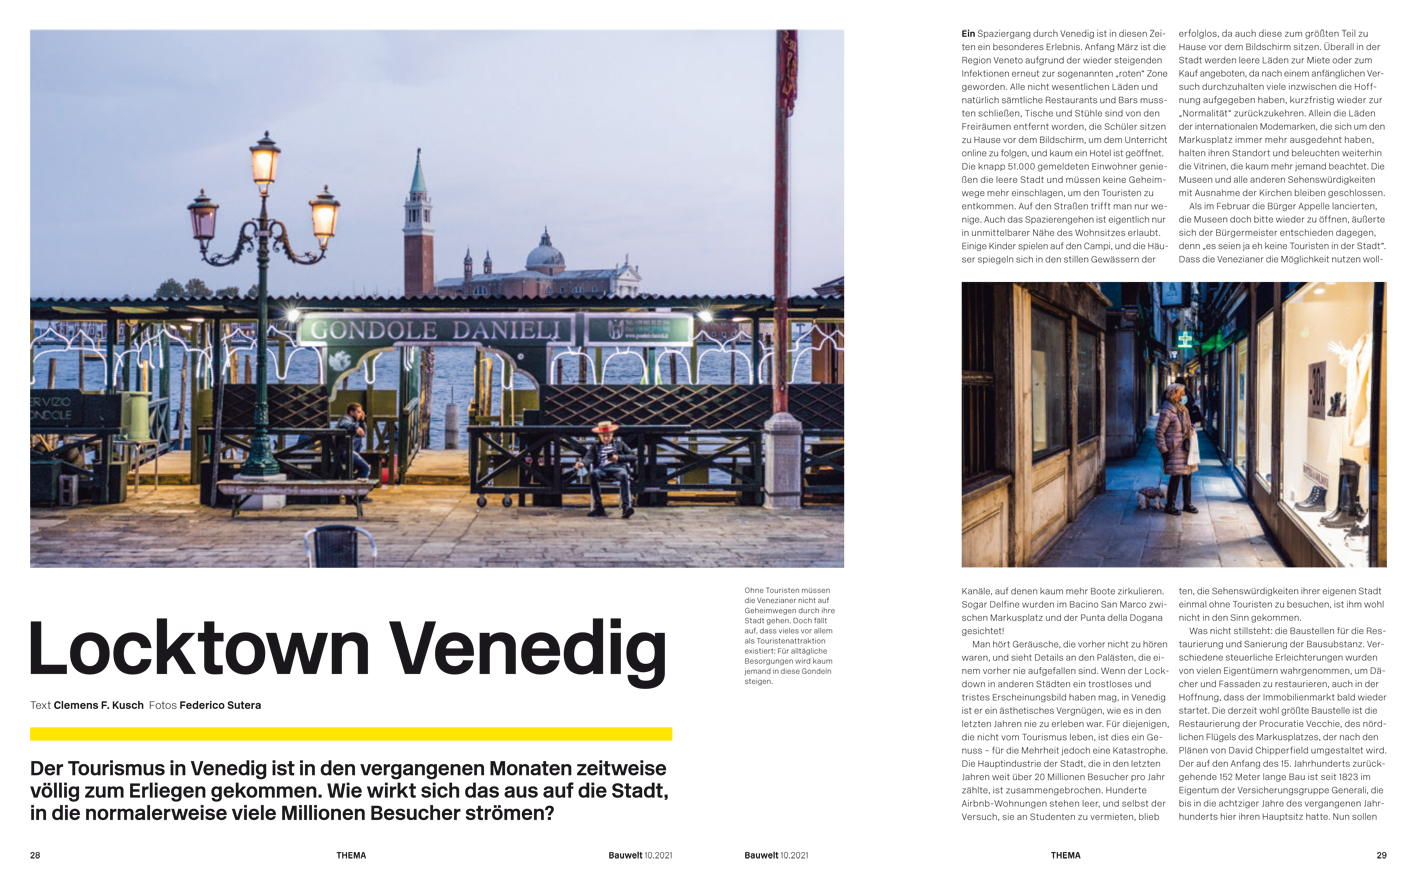 Lockdown Venedig